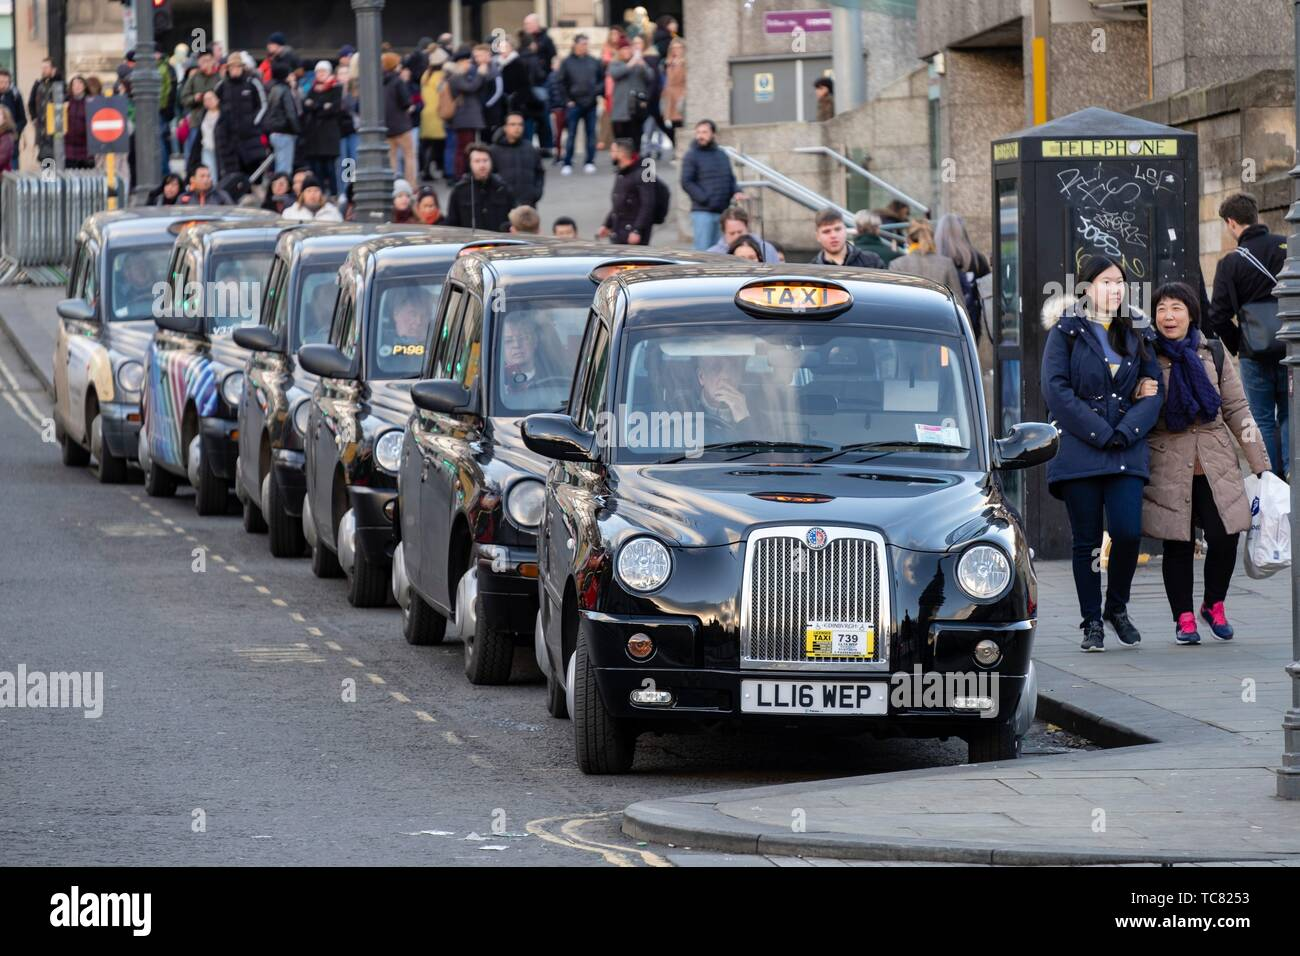 Taxi rank, Edinburgh, Lowlands, Scotland, United Kingdom. Stock Photo